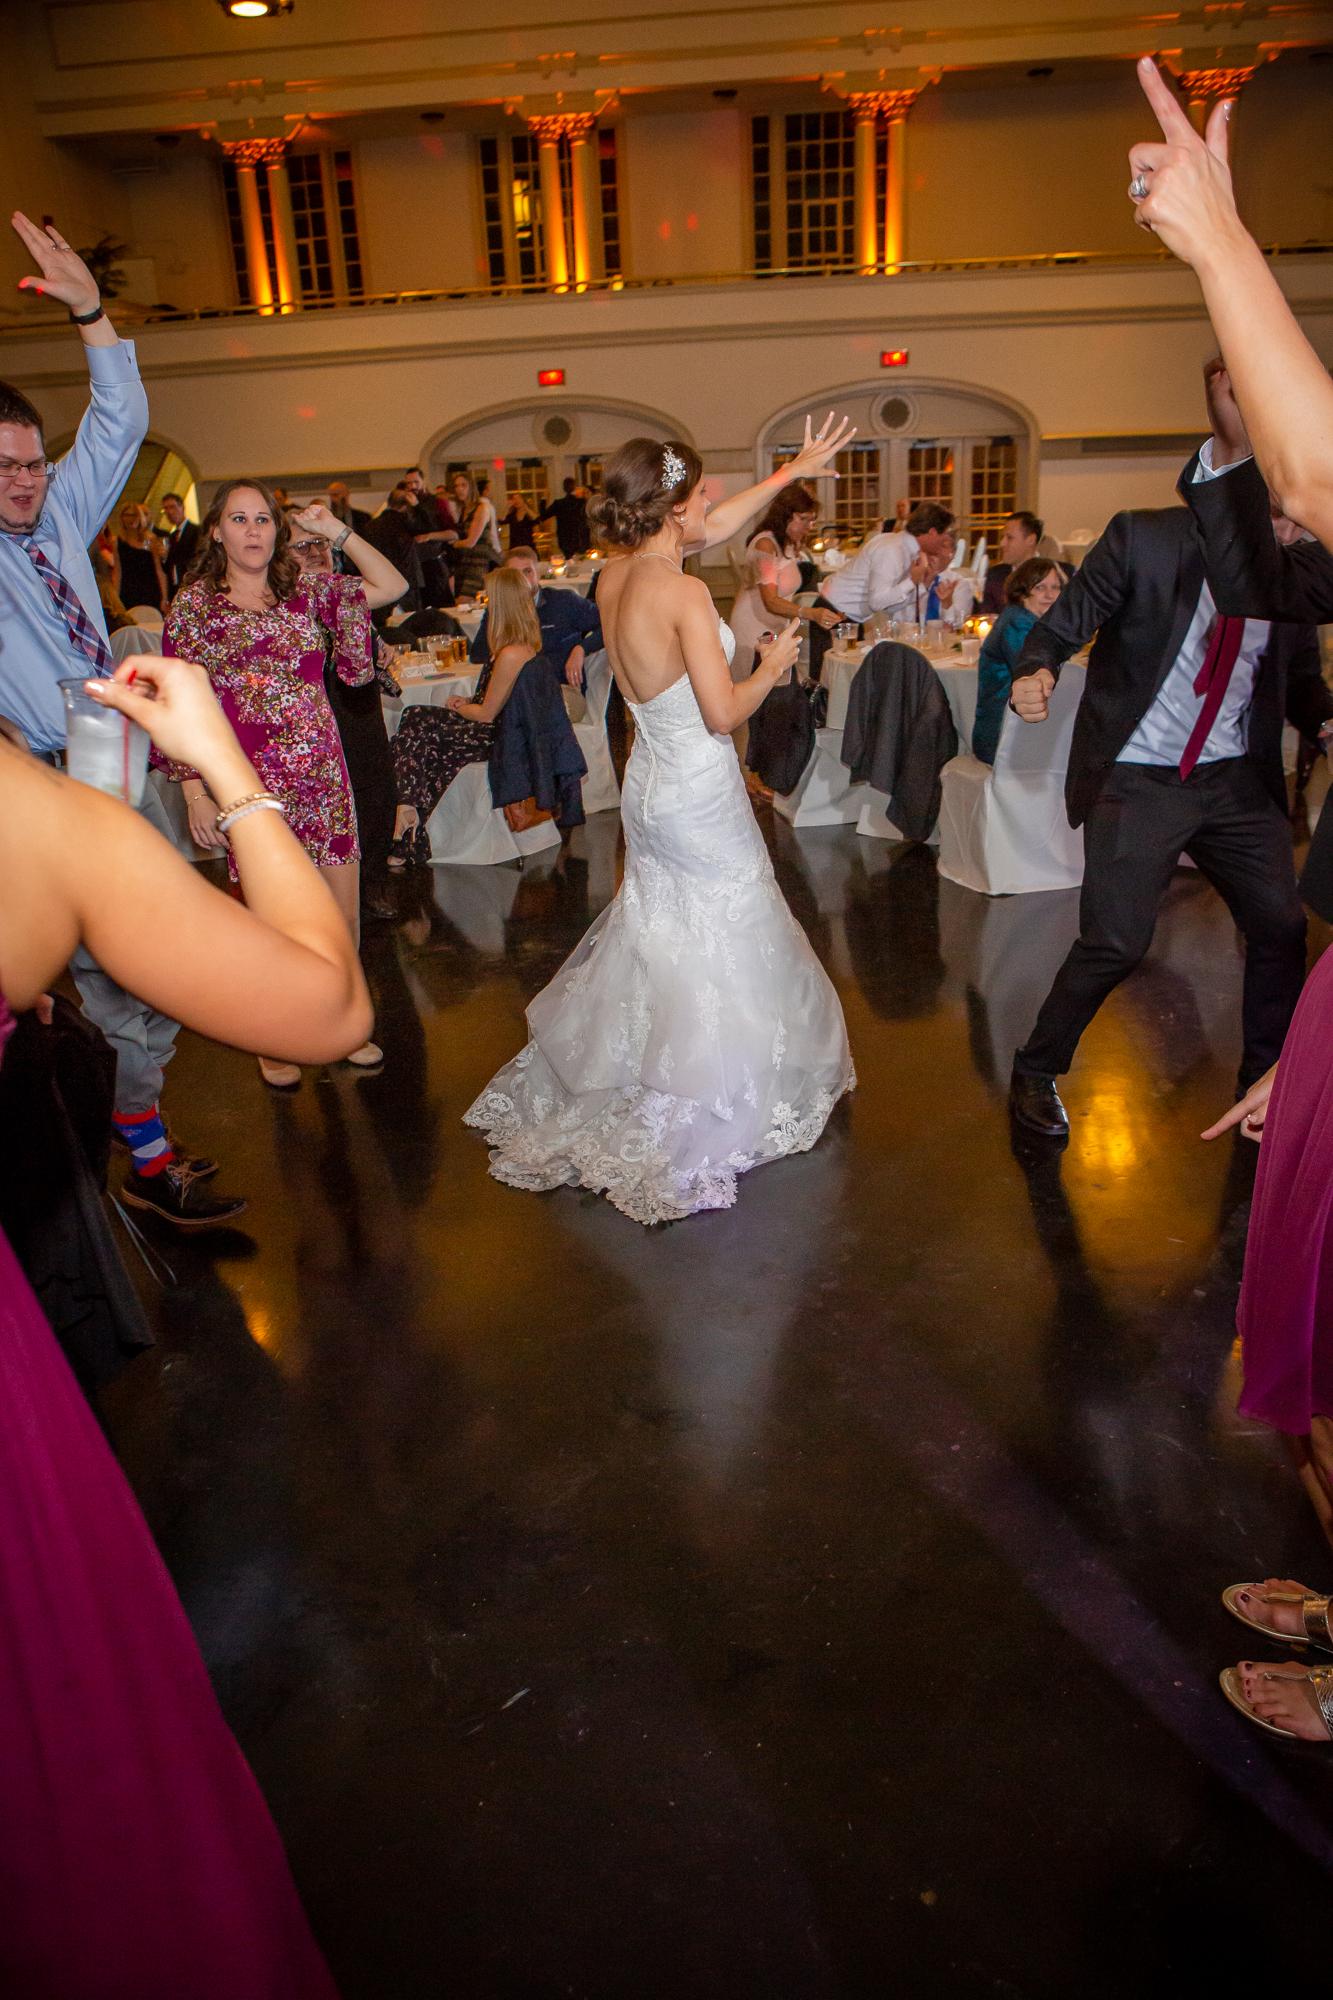 Harro-East-Theatre-and-Ballroom-wedding-8269.jpg